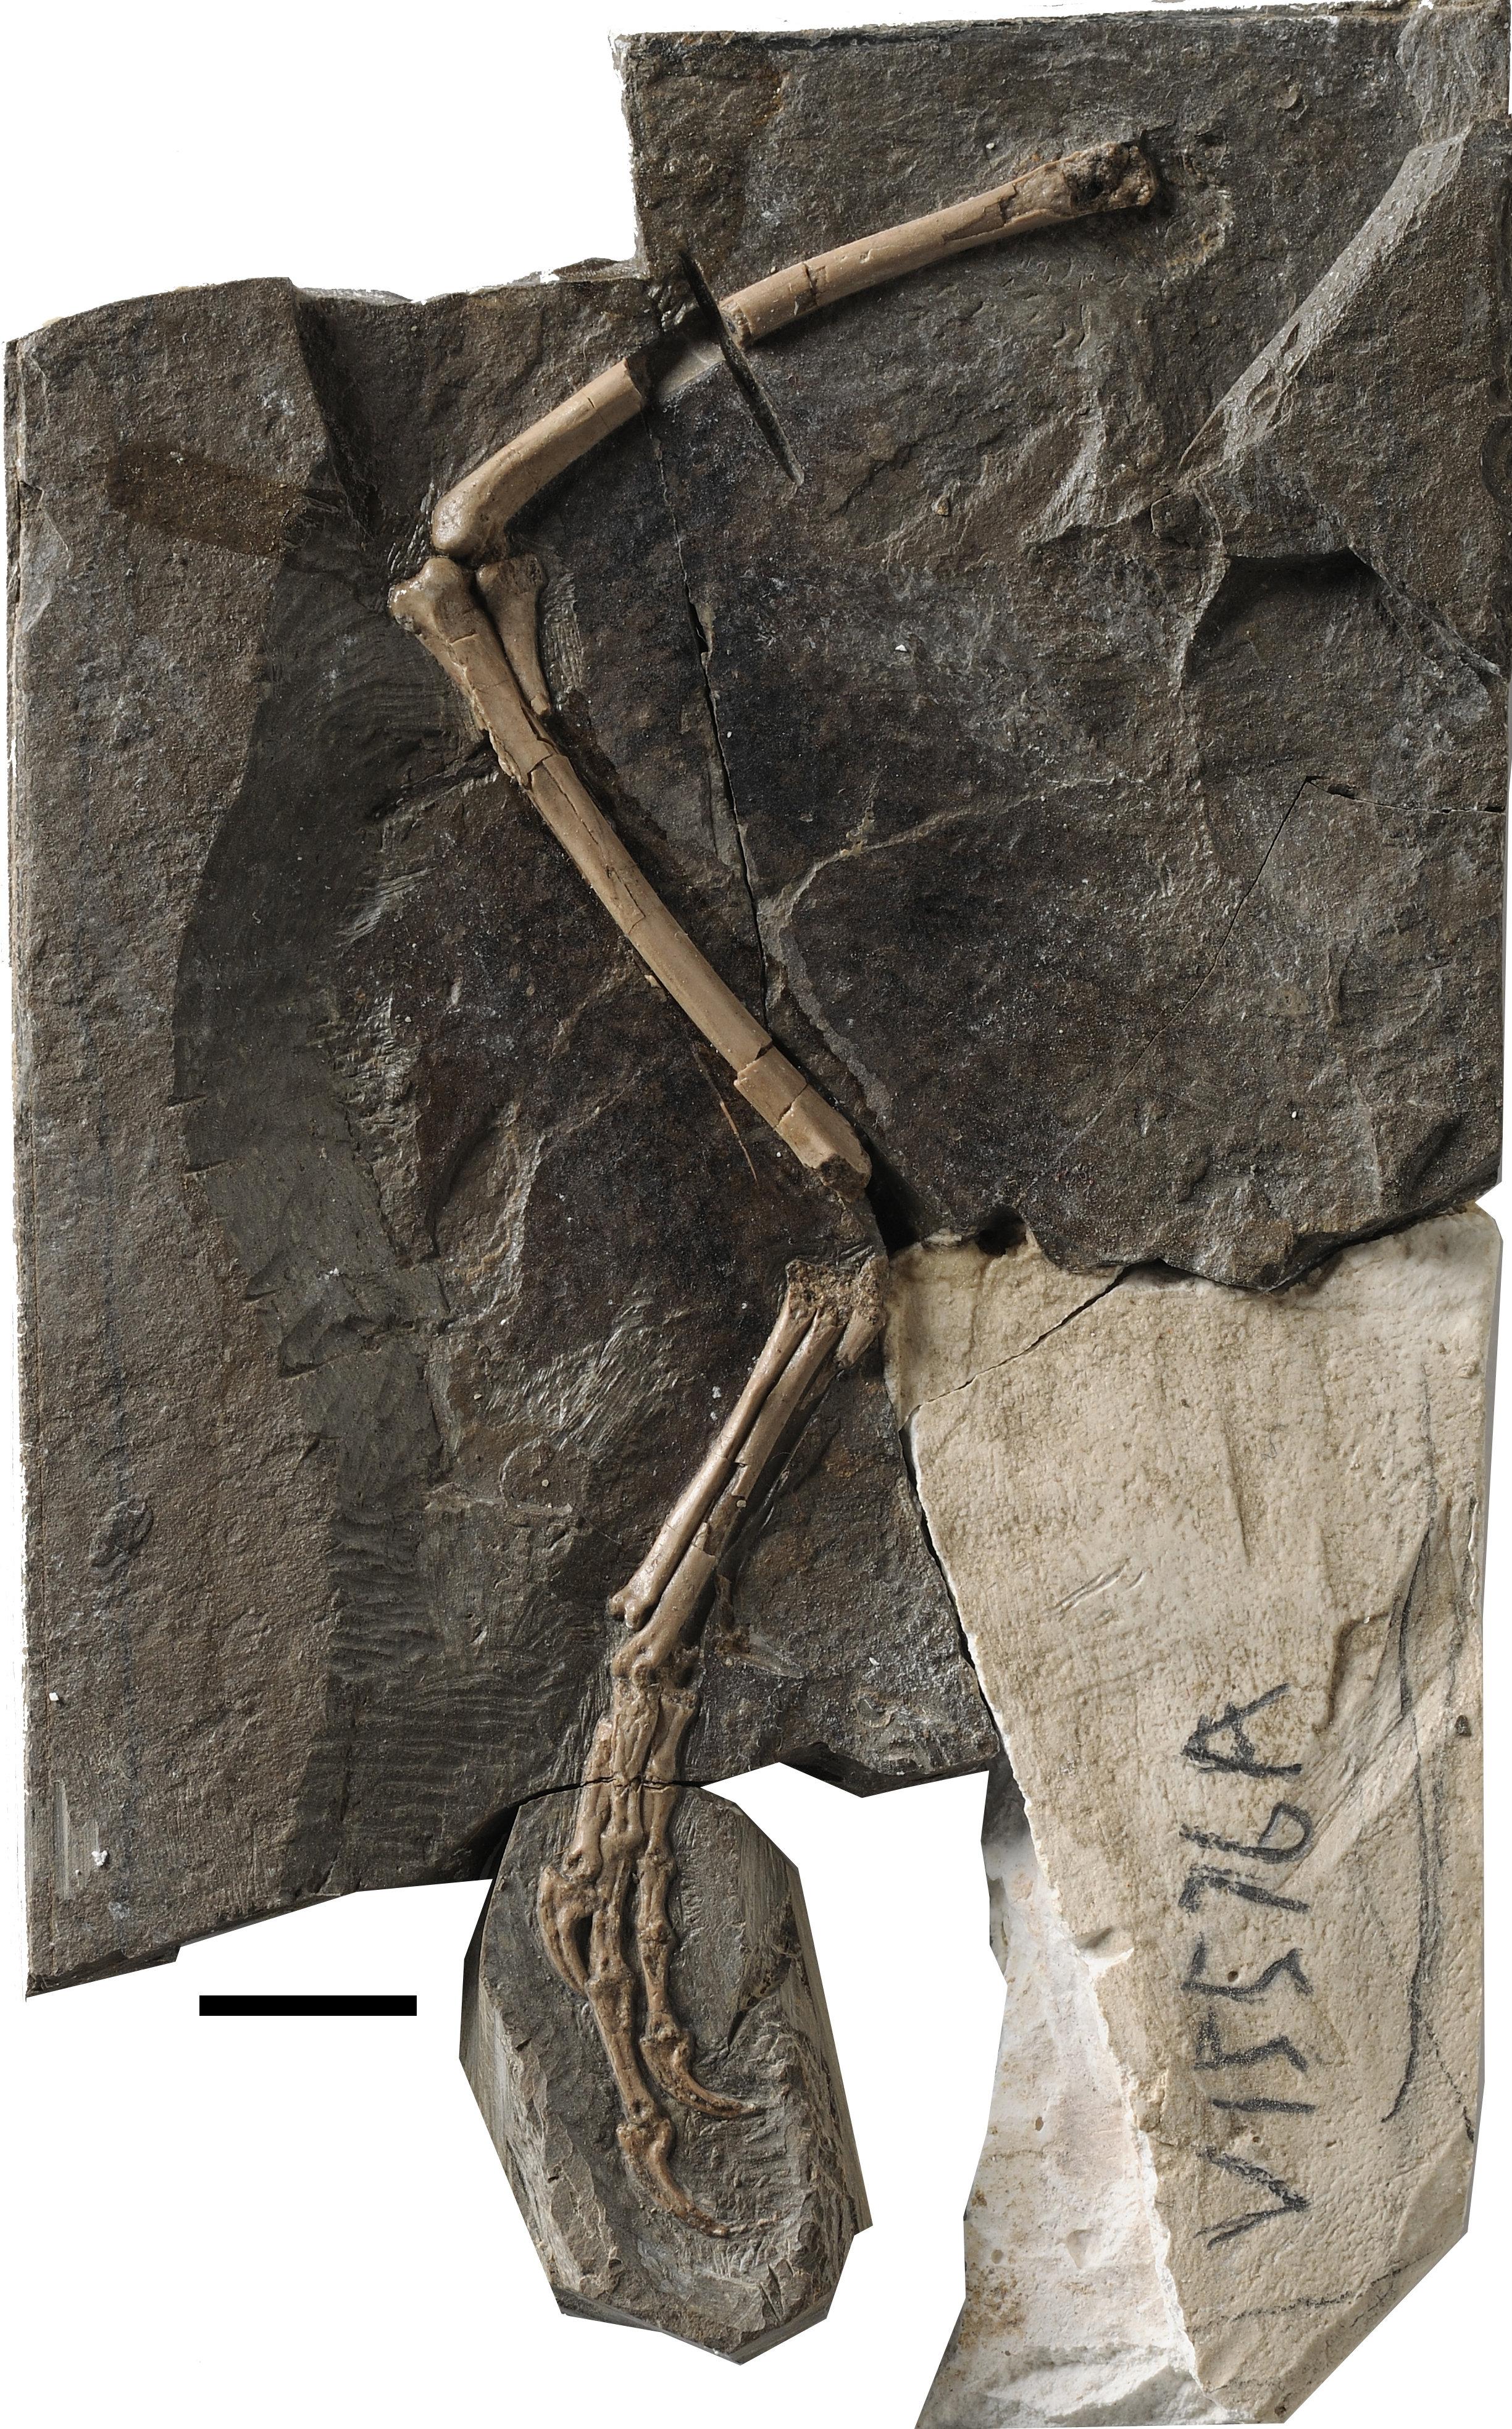 Medullary bone found in Cretaceous birds